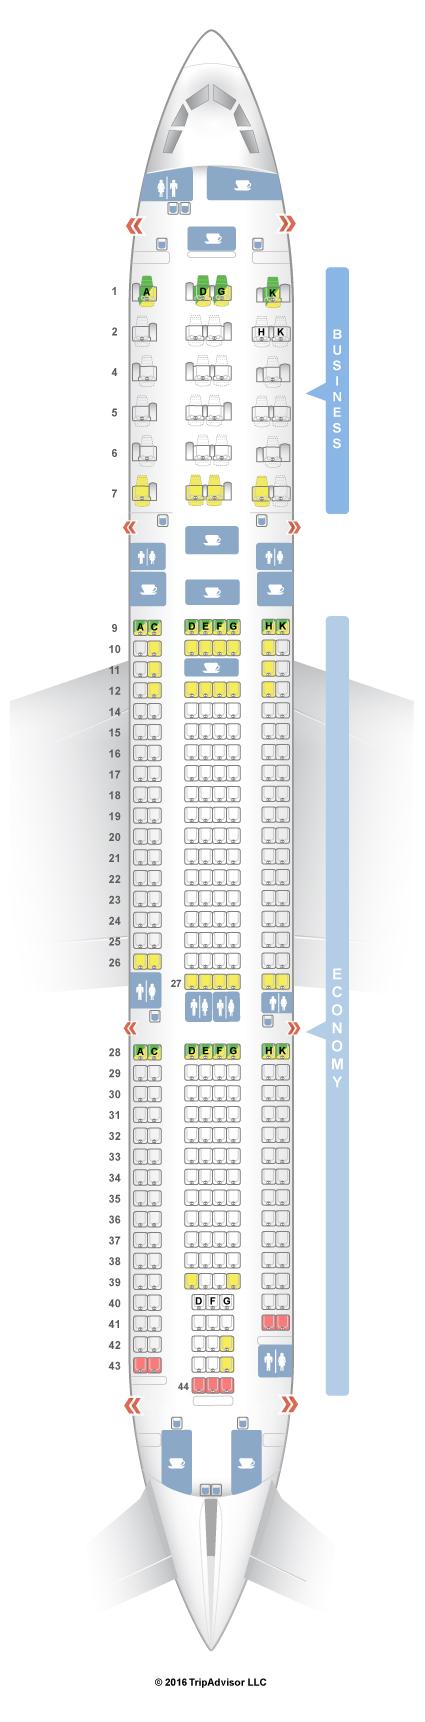 Seatguru Seat Map Malaysia Airlines Airbus A330 300 333 V1